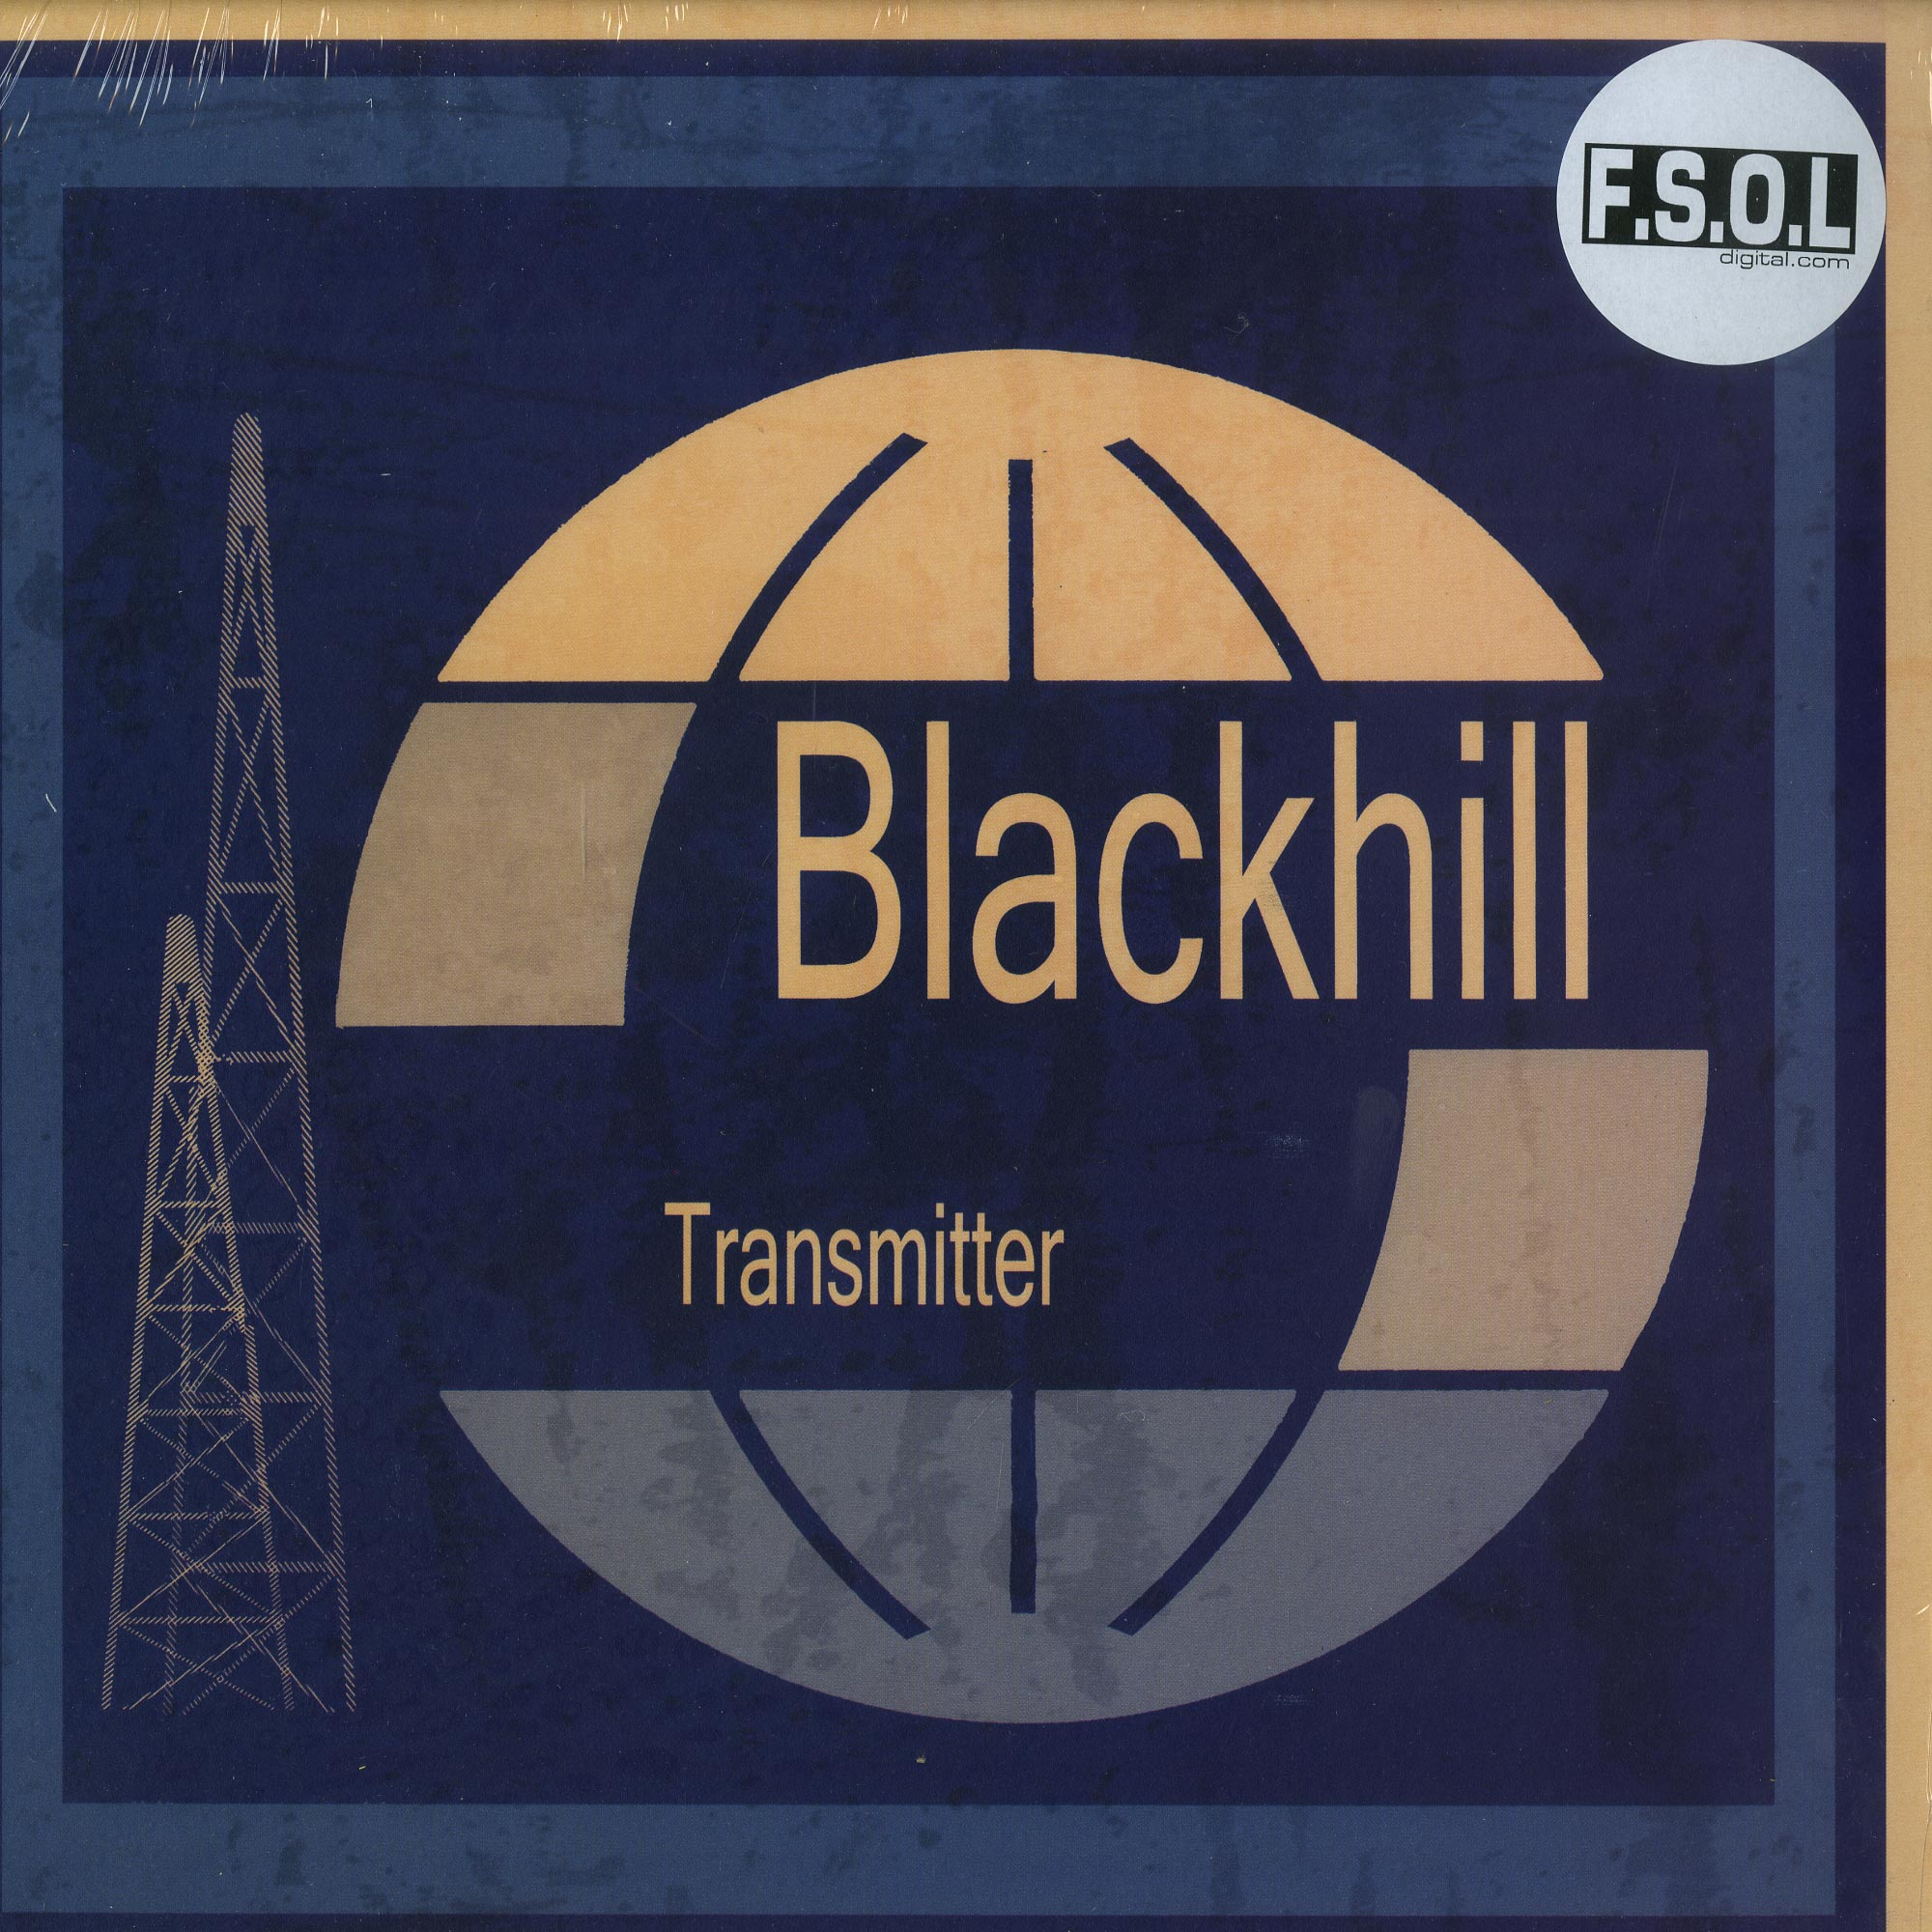 Blackhill Transmitter - BLACKHILL TRANSMITTER